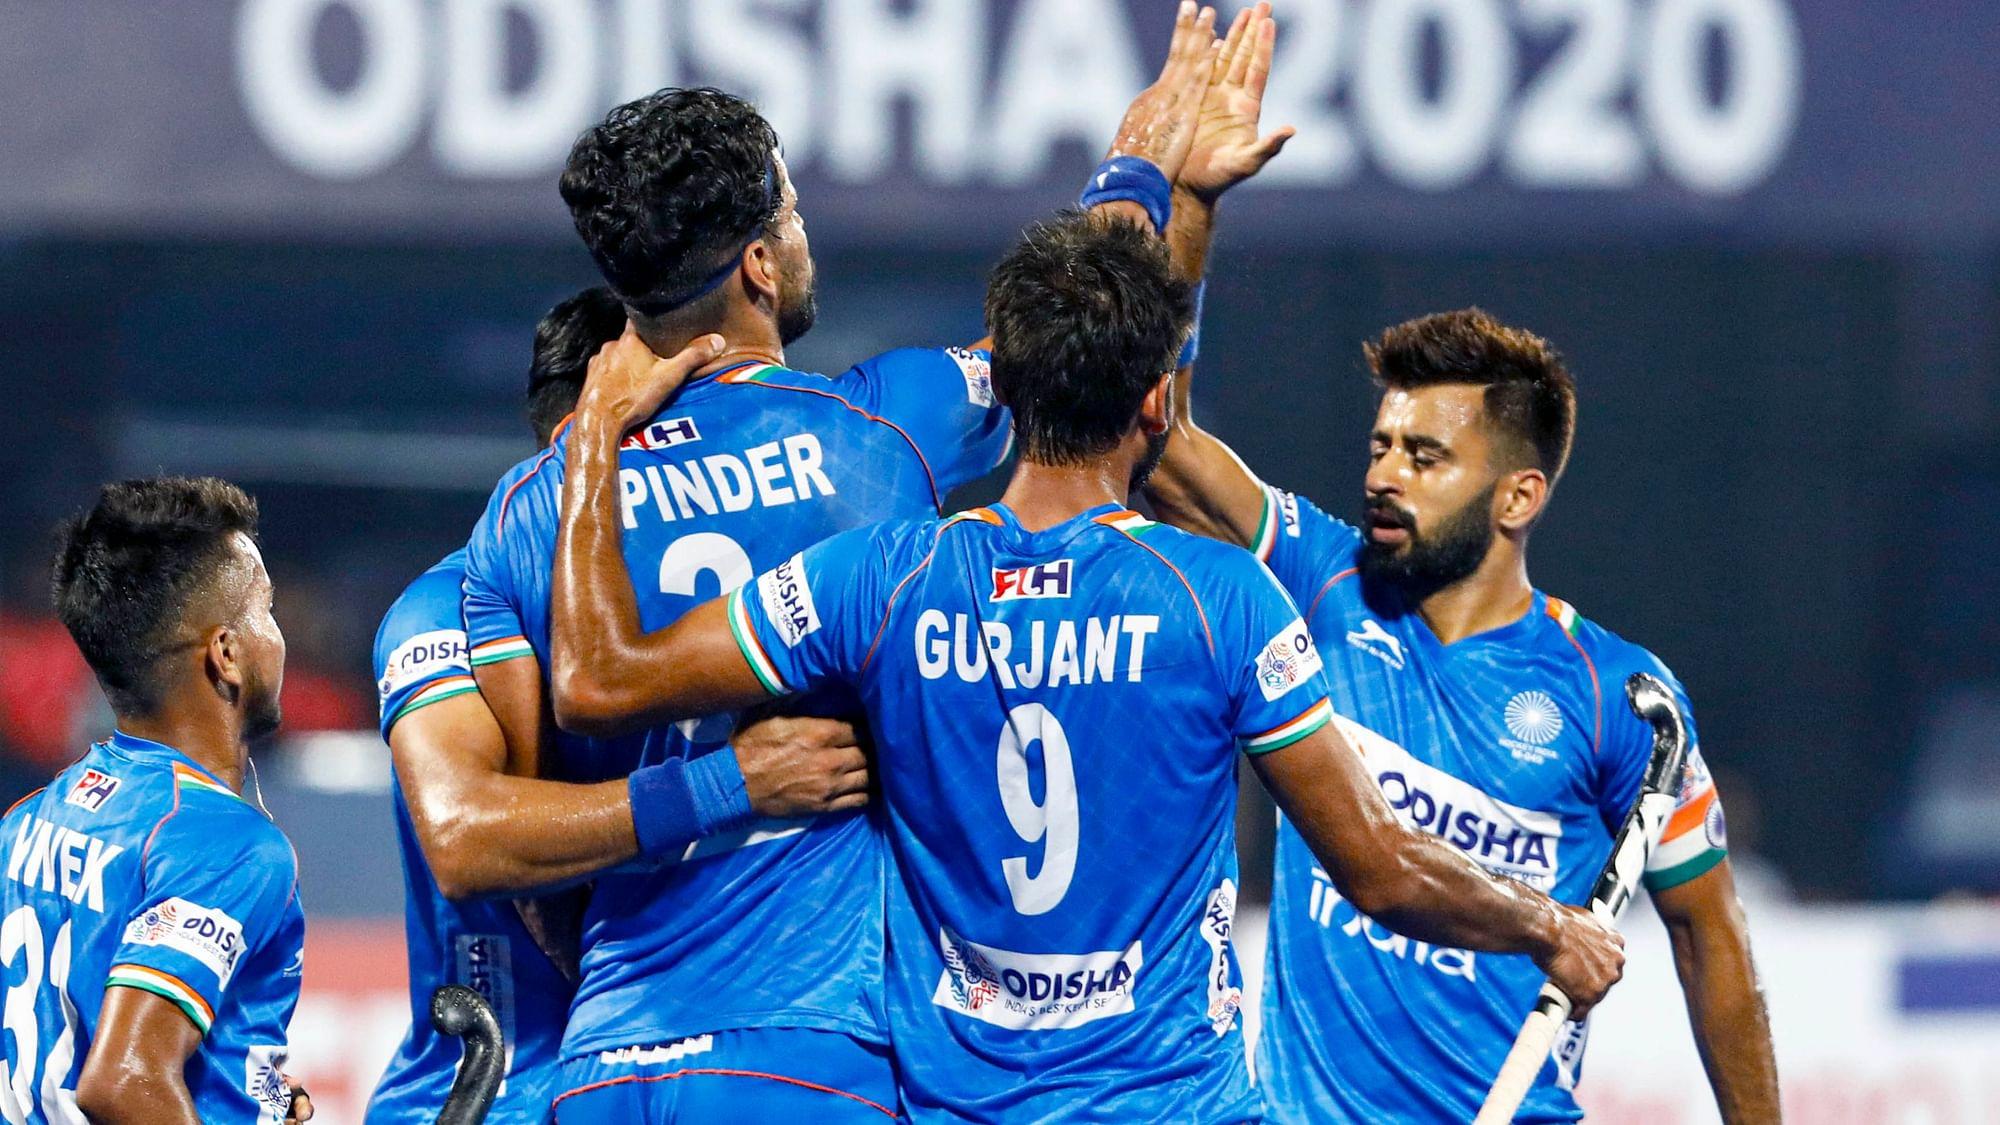 India Thrash World No 3 Netherlands 5-2 in FIH Pro League Opener